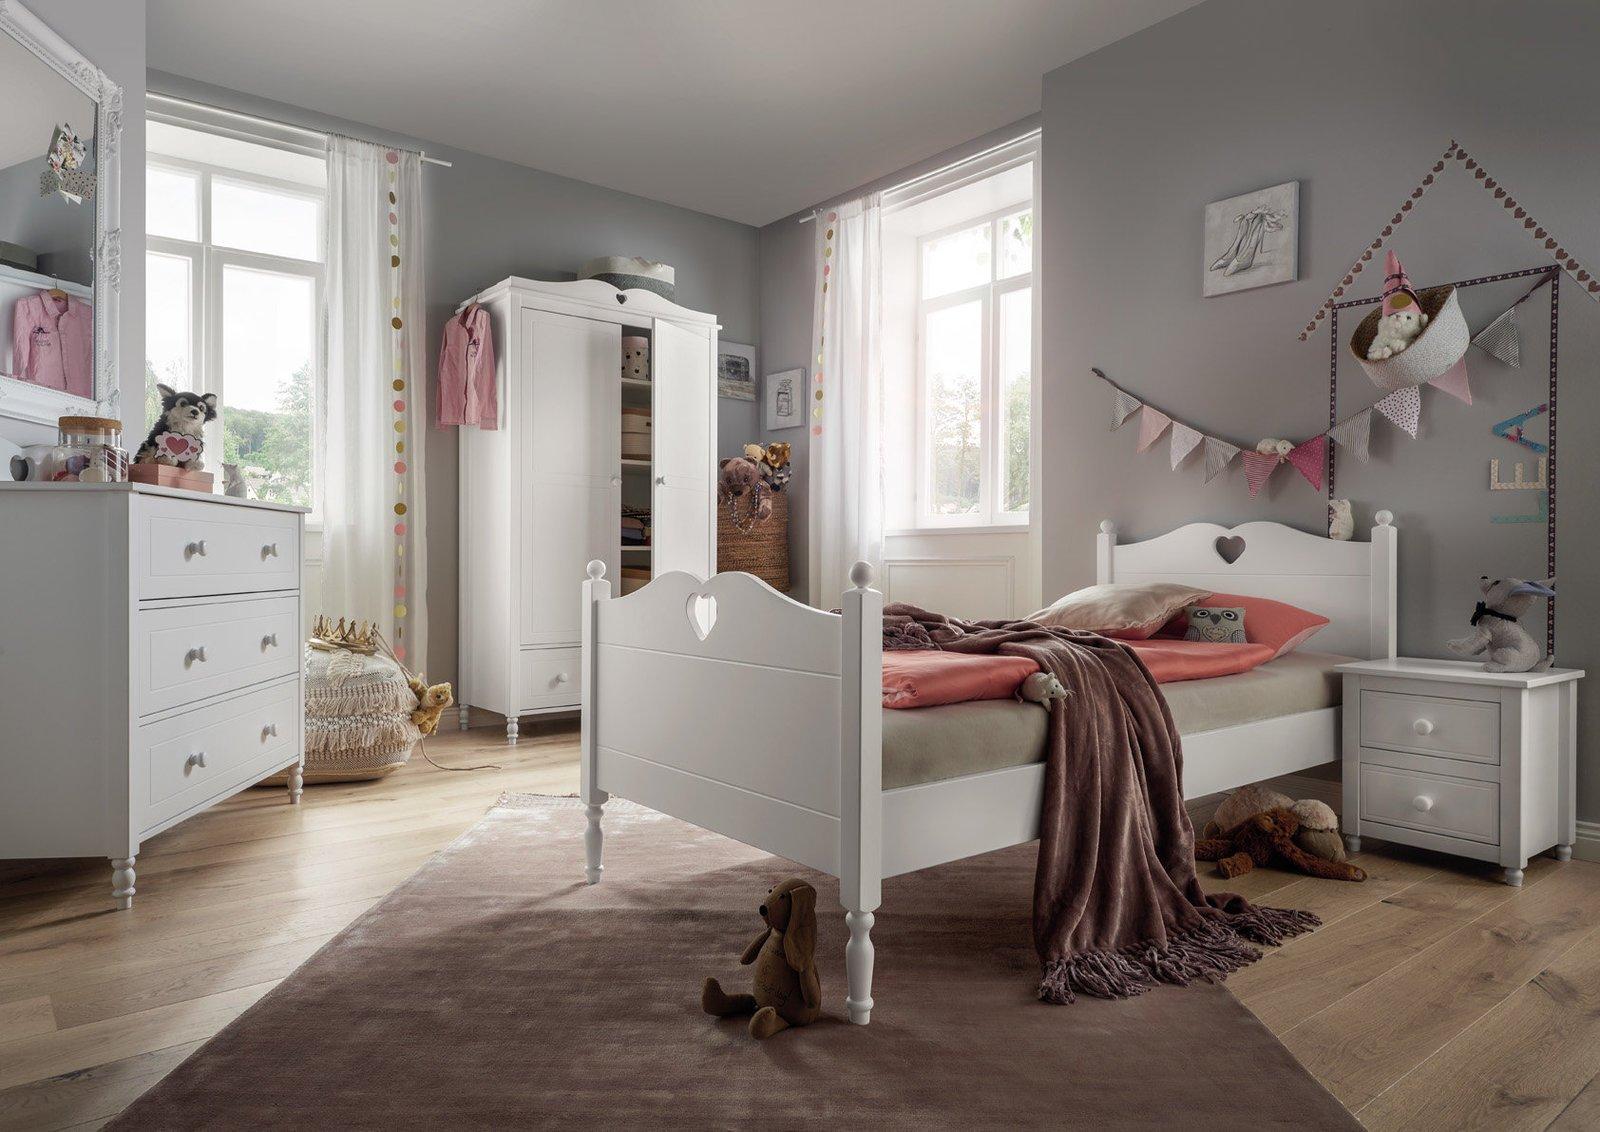 InfansKids Babyzimmer Emma, Bild 2